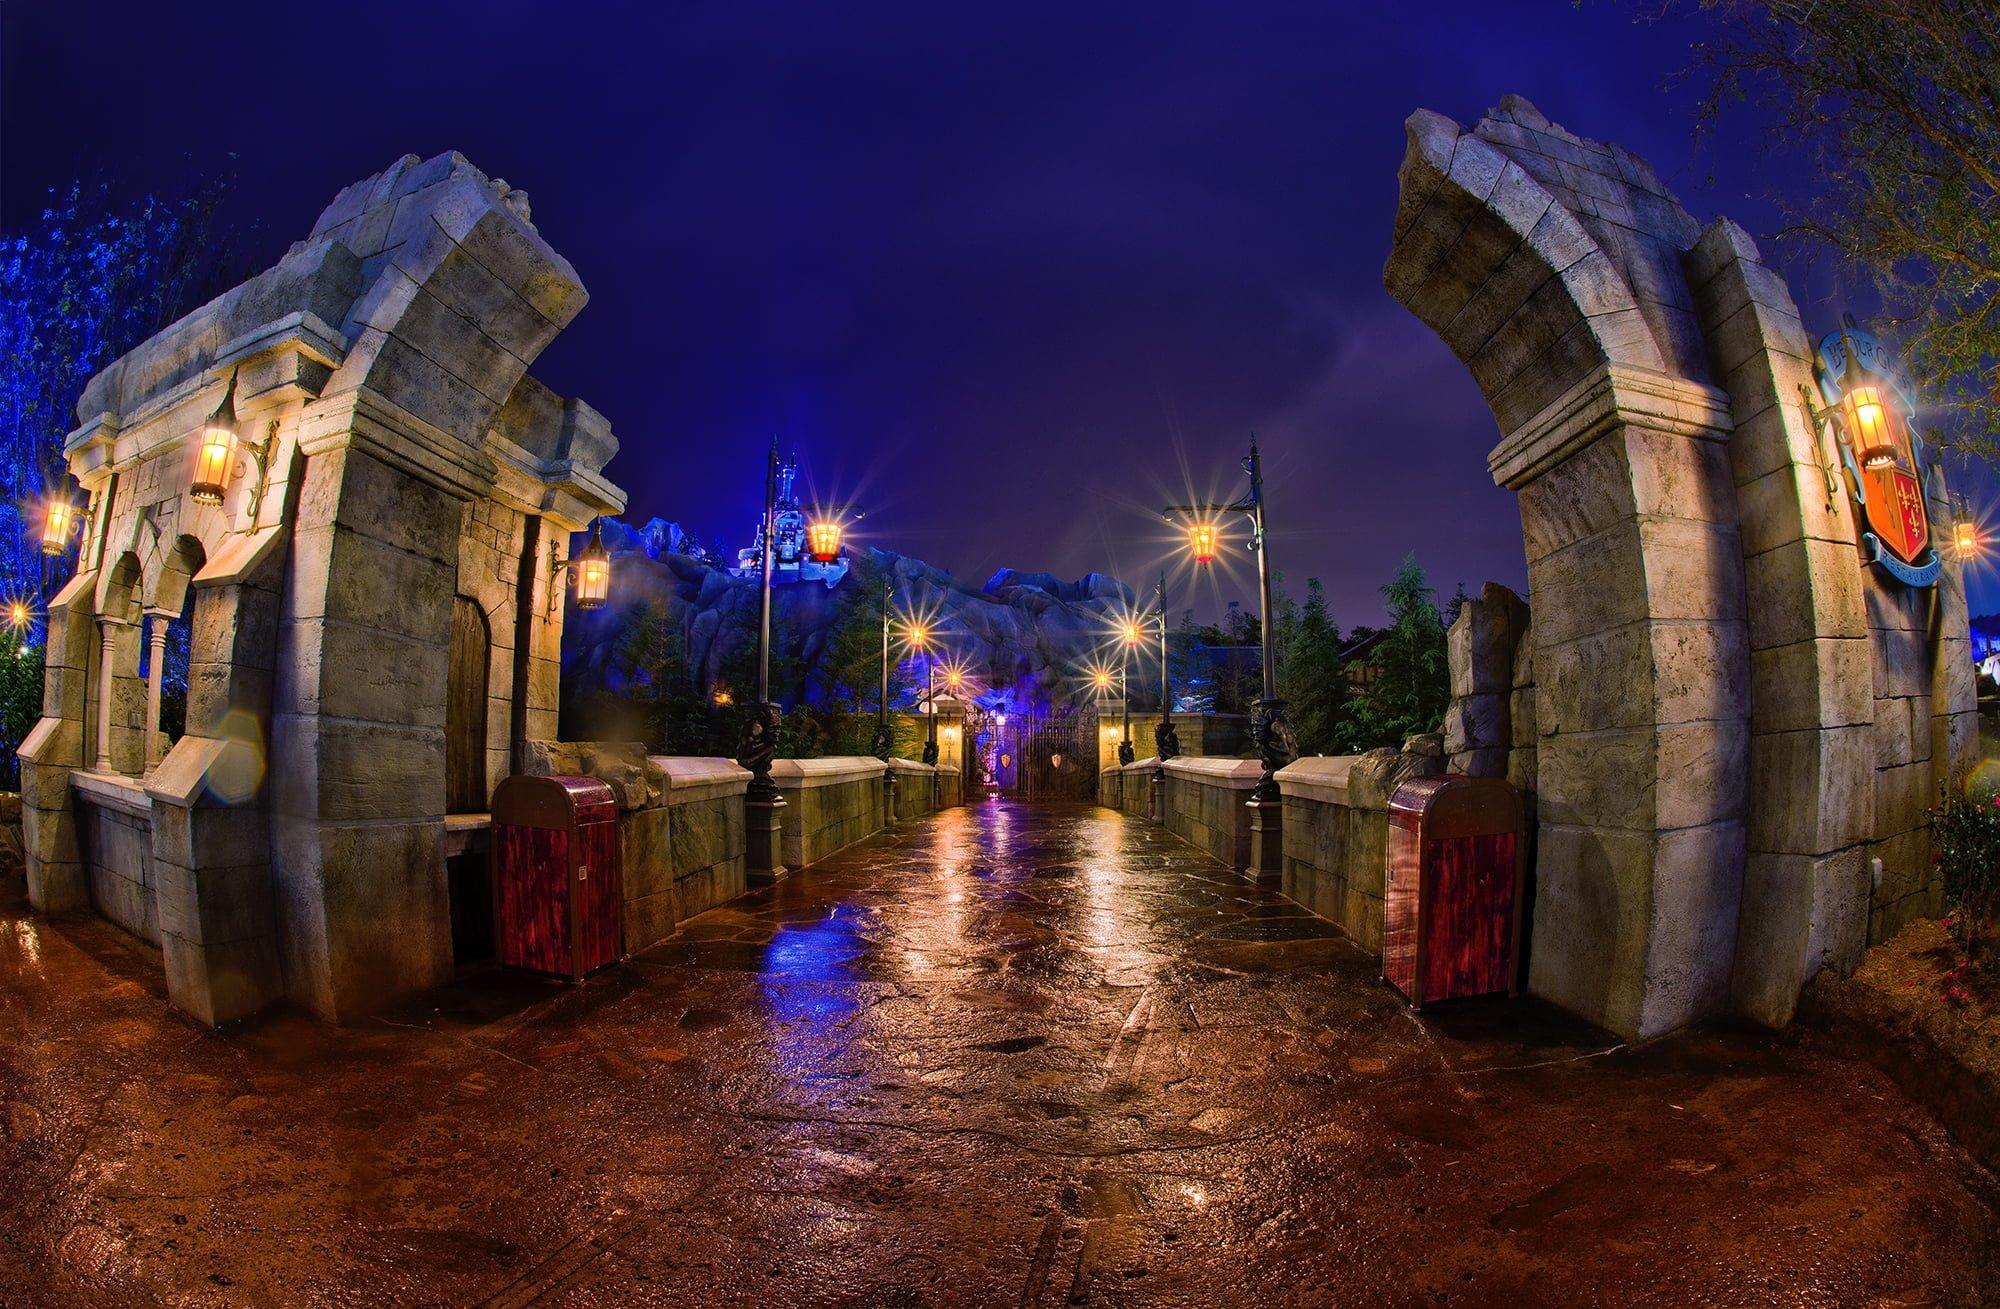 Best Magic Kingdom Counter Service Restaurants Disney Tourist Blog - Magic kingdom table service restaurants